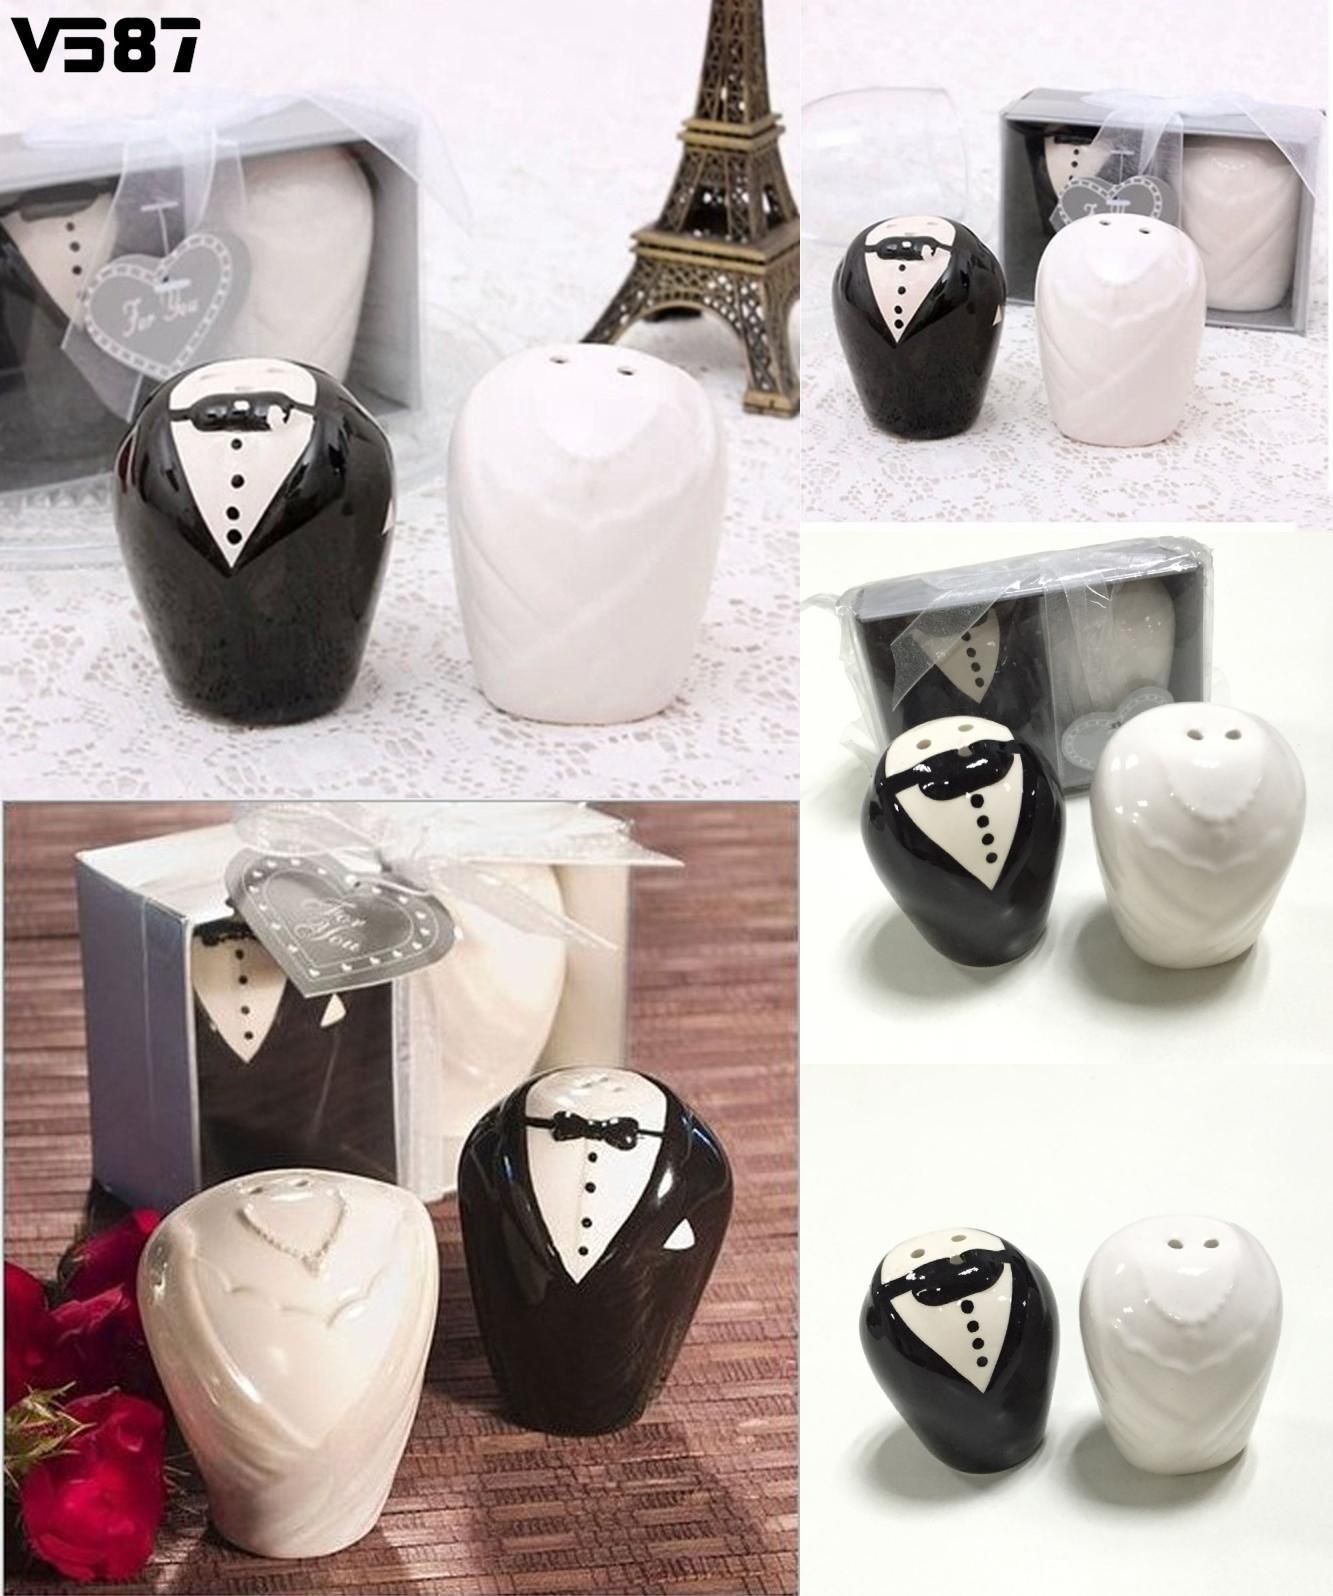 Visit to Buy] 2Pcs/Pair Spice Jar Bottle Ceramic Wedding Favors ...